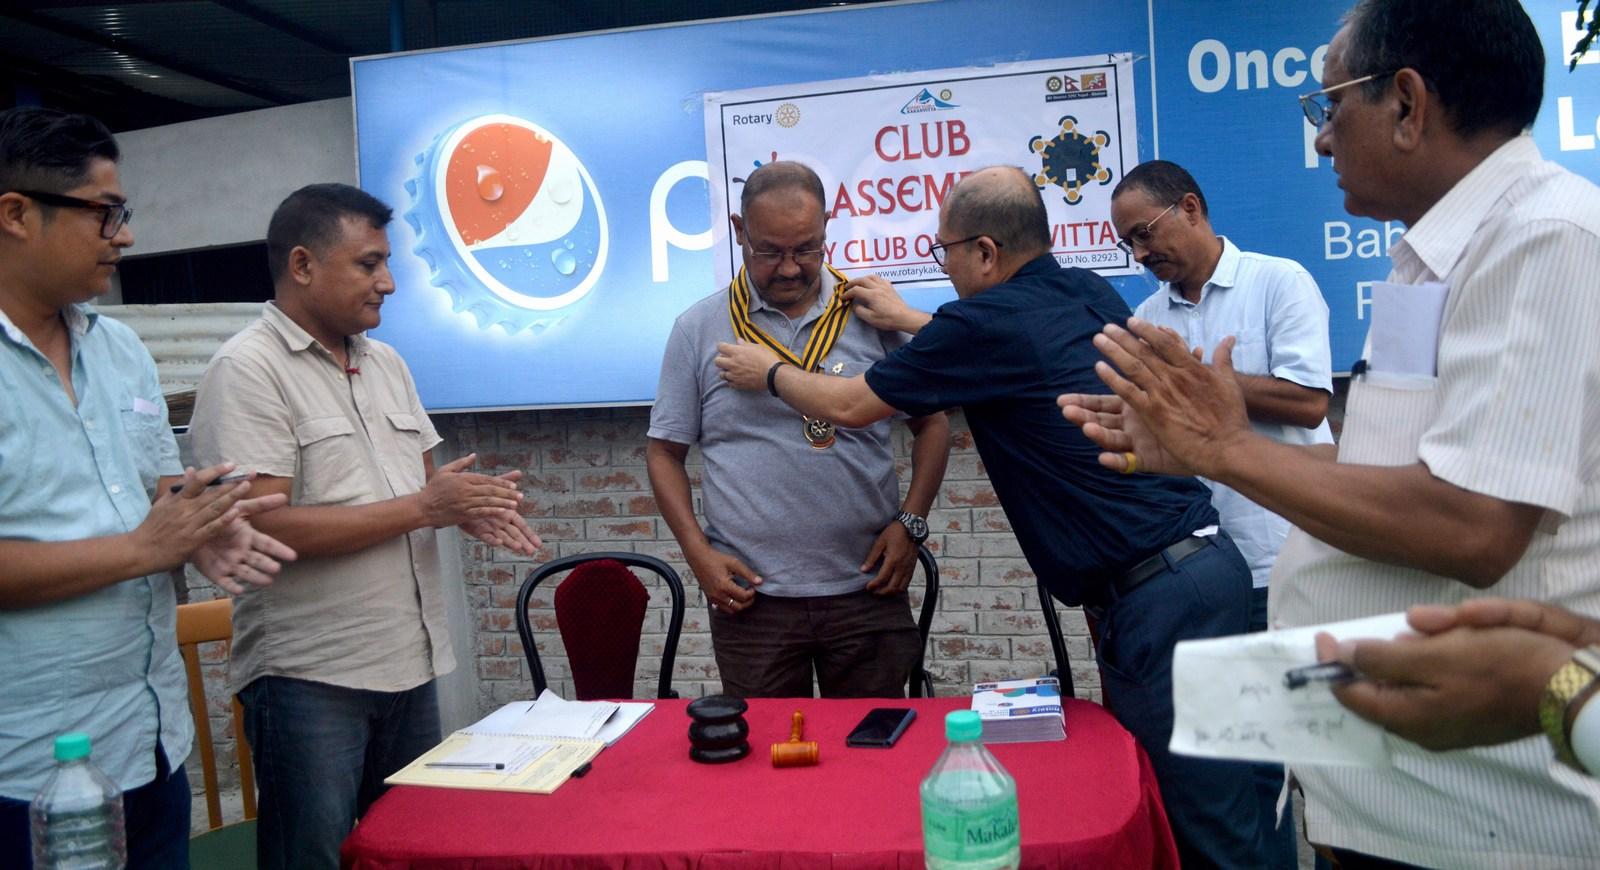 1st-Club-Assembly-2018-19-Rotary-Club-of-Kakarvitta-5